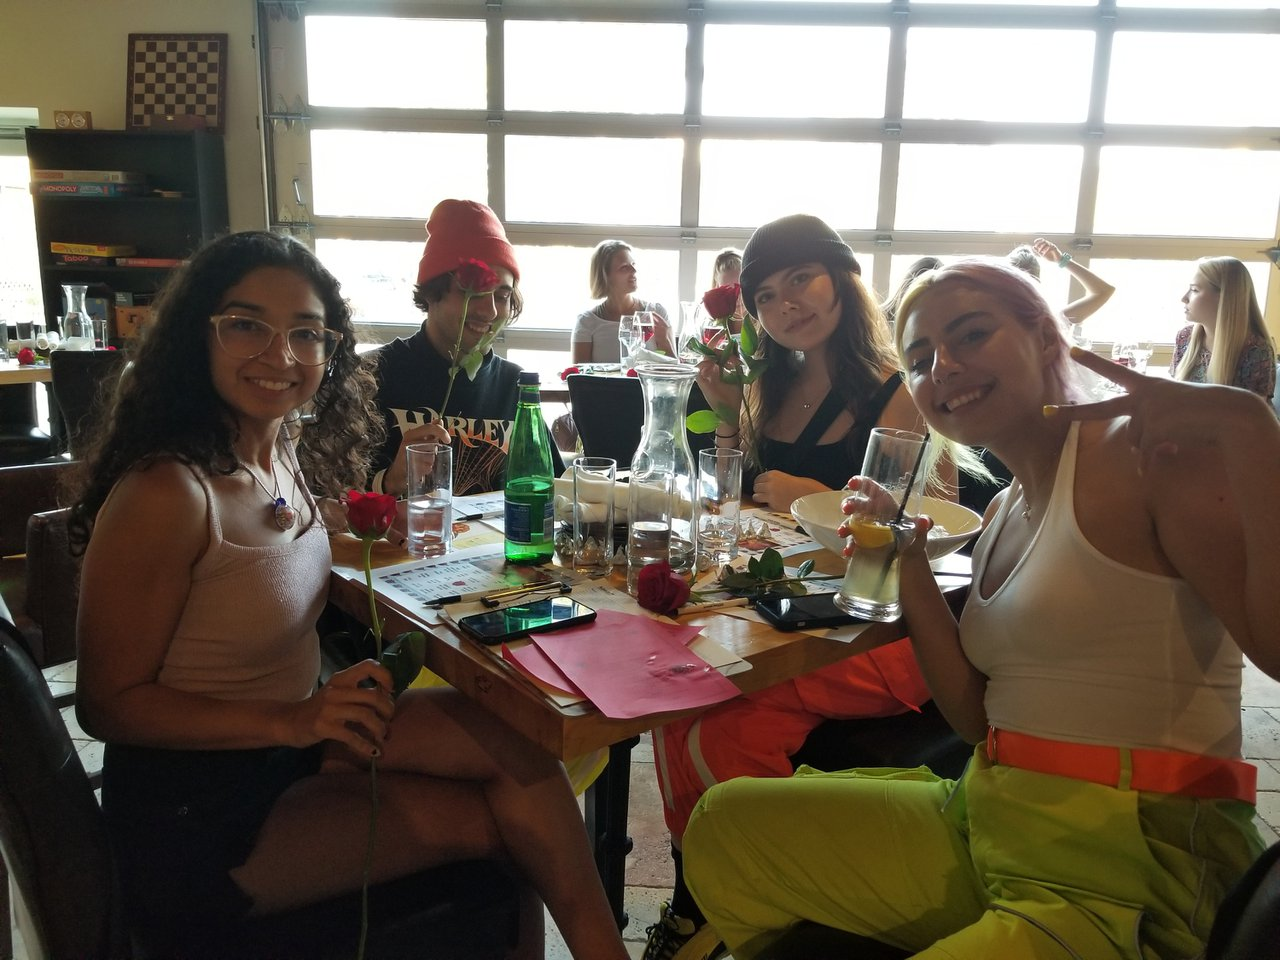 The Bachelorette Finale Watch Party photo 20190729_192026.jpg